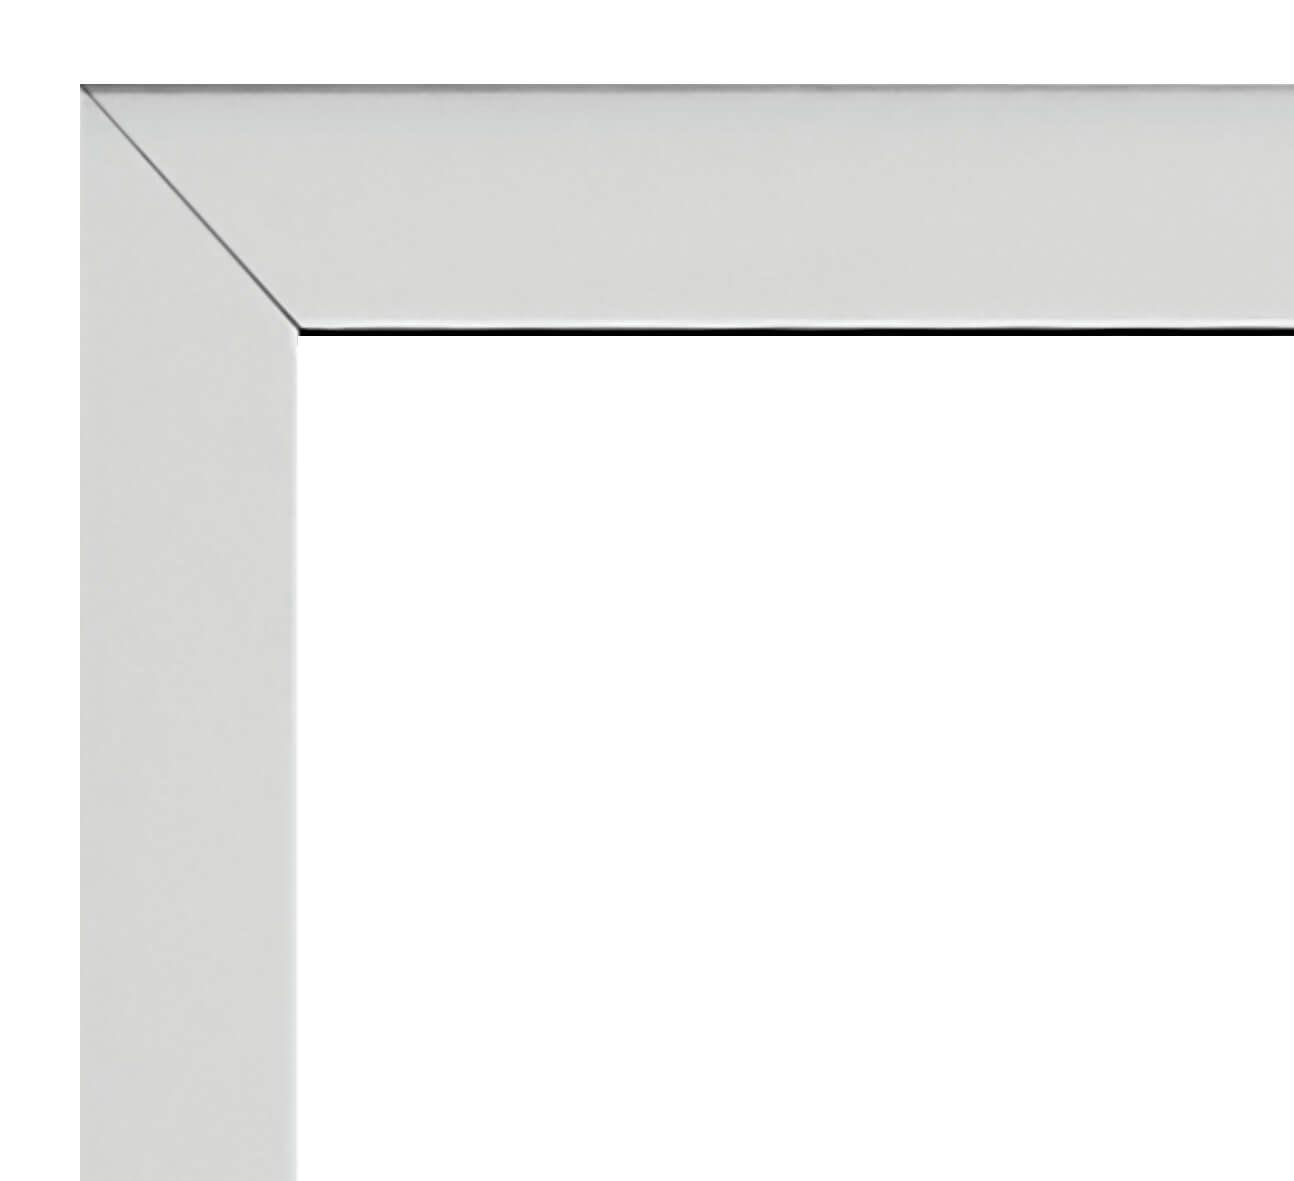 Aluminium Guarnição - 1.00x1.50 Ref. 74.92.615-0 Sasazaki